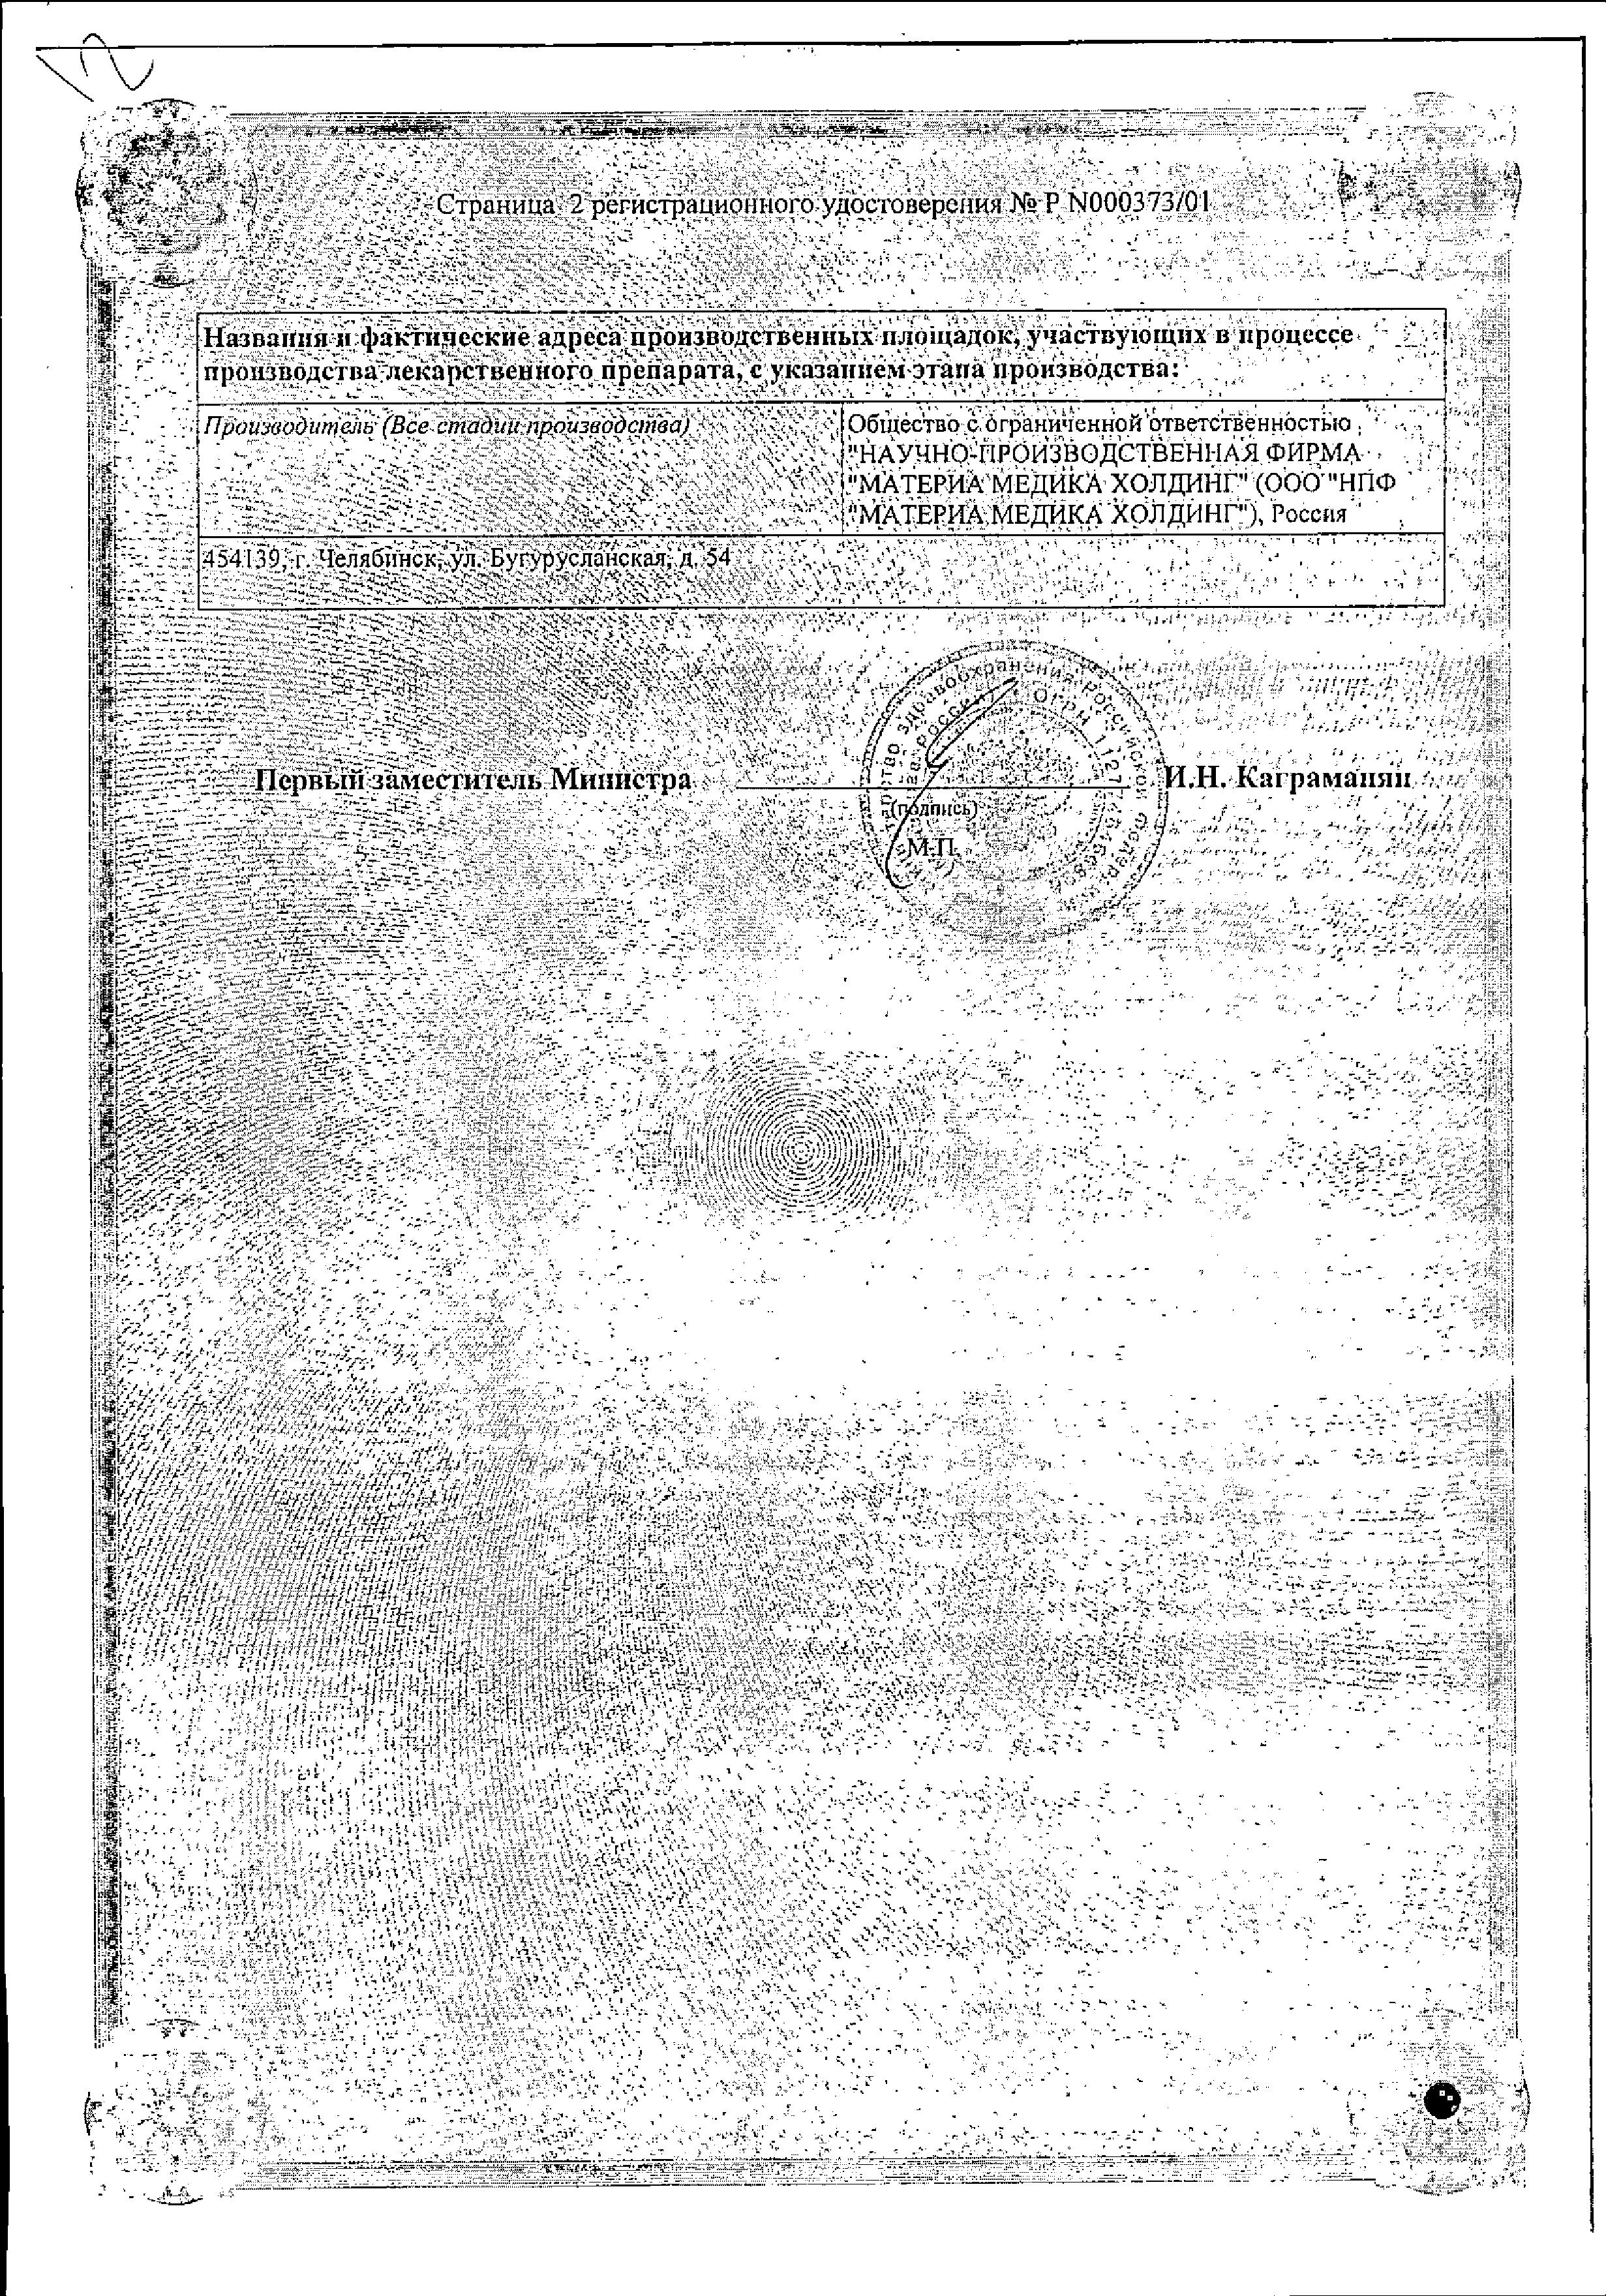 Артрофоон сертификат